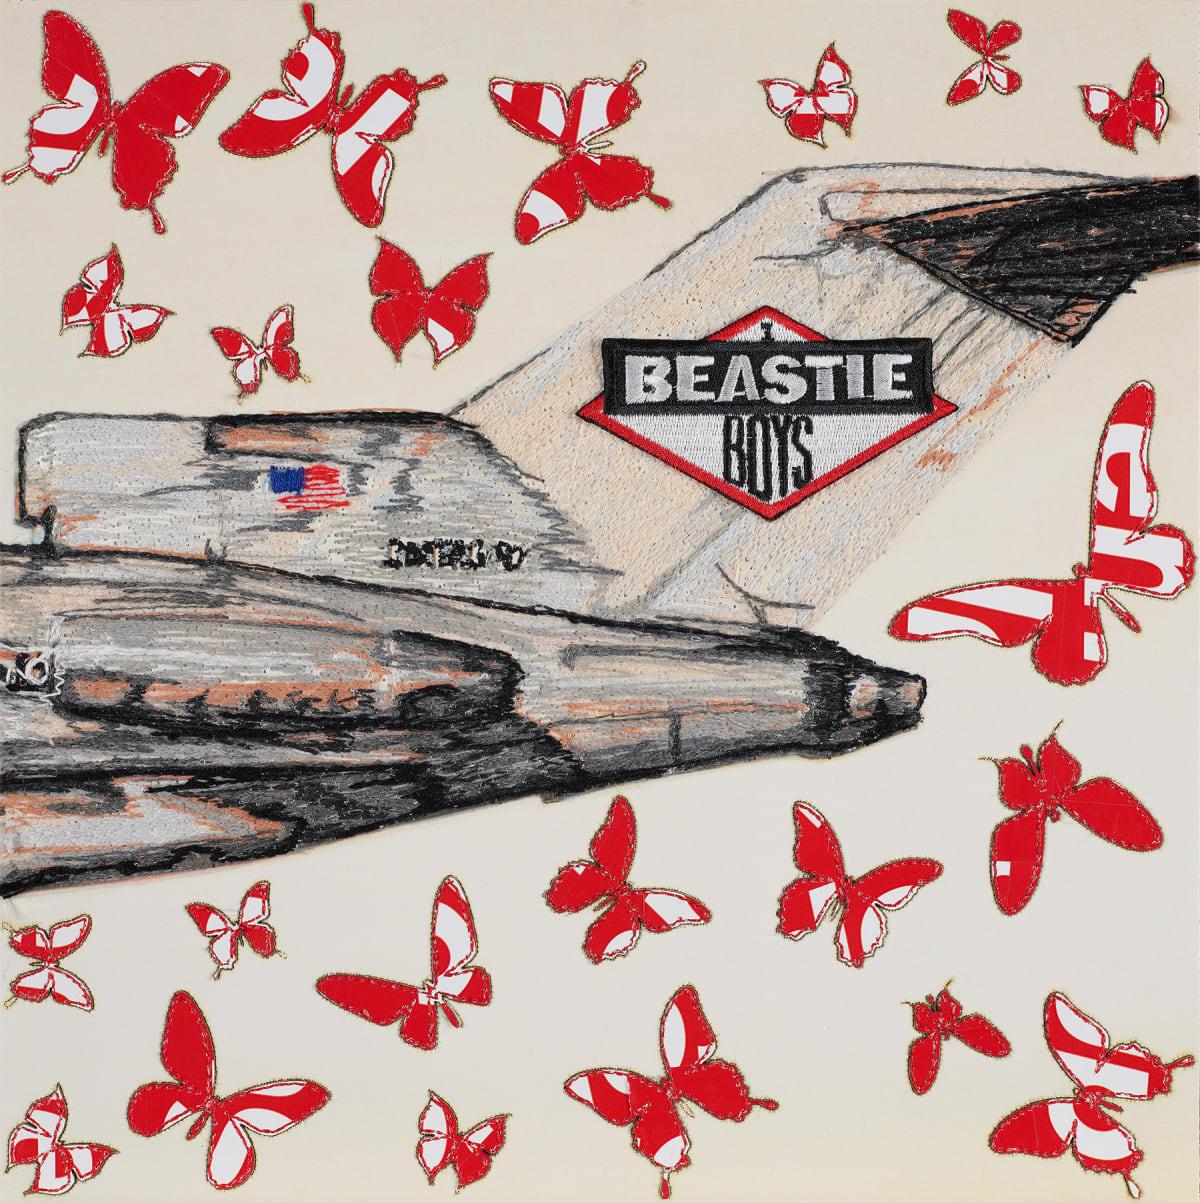 Stephen Wilson, Licensed to Ill, Beastie Boys, 2019